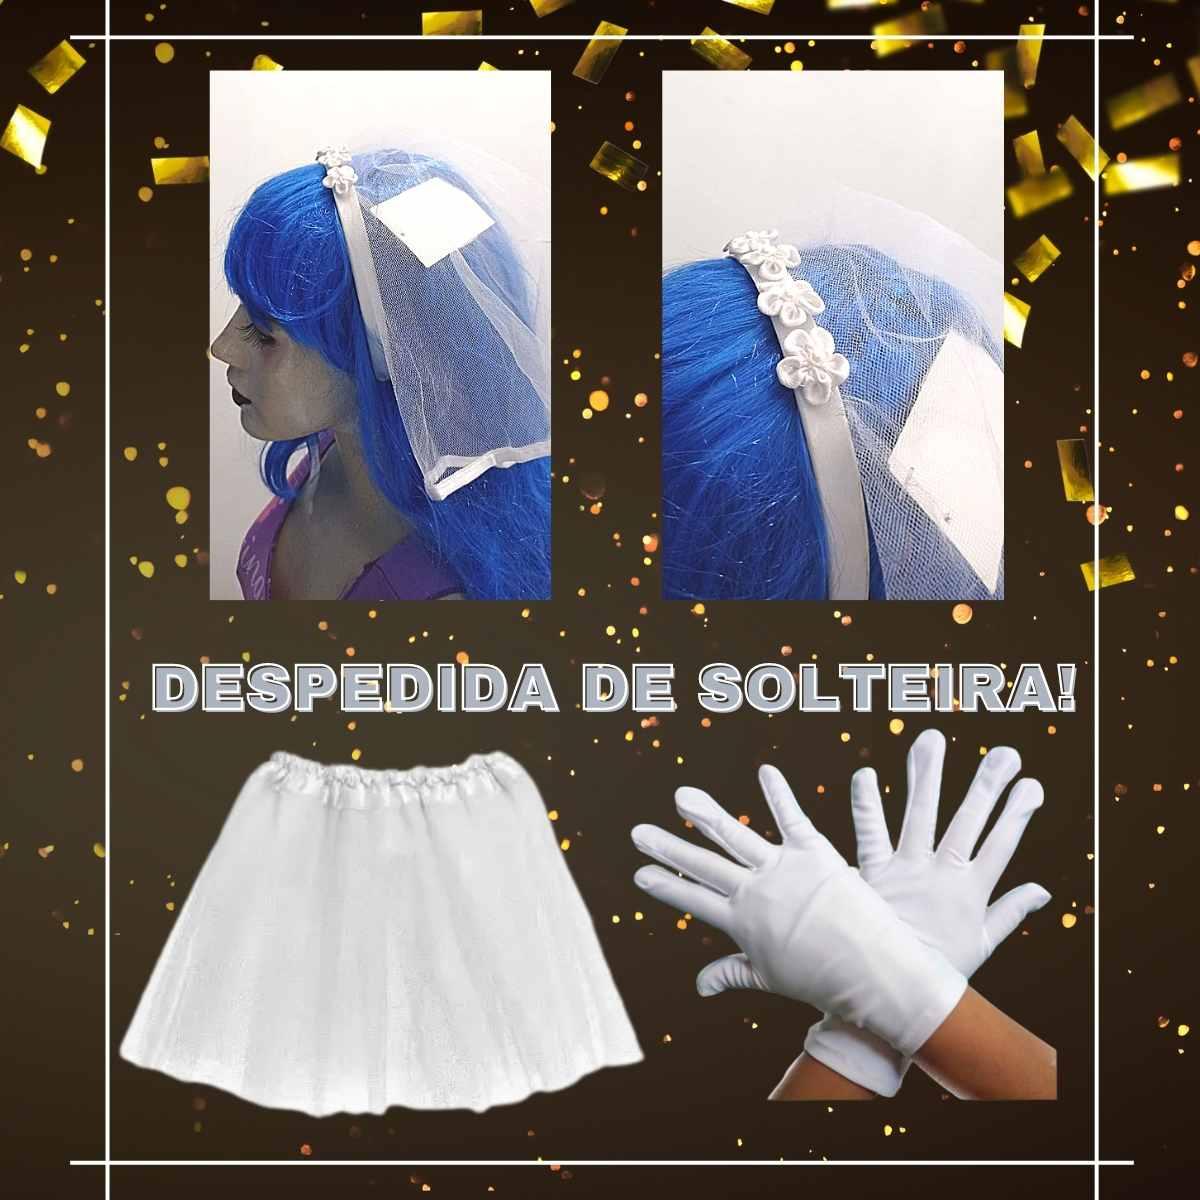 Kit Fantasia Despedida de Solteira Simples (Saia de Tule Branca Adulta + Luva Branca n4 + Tiara Véu de Noiva)